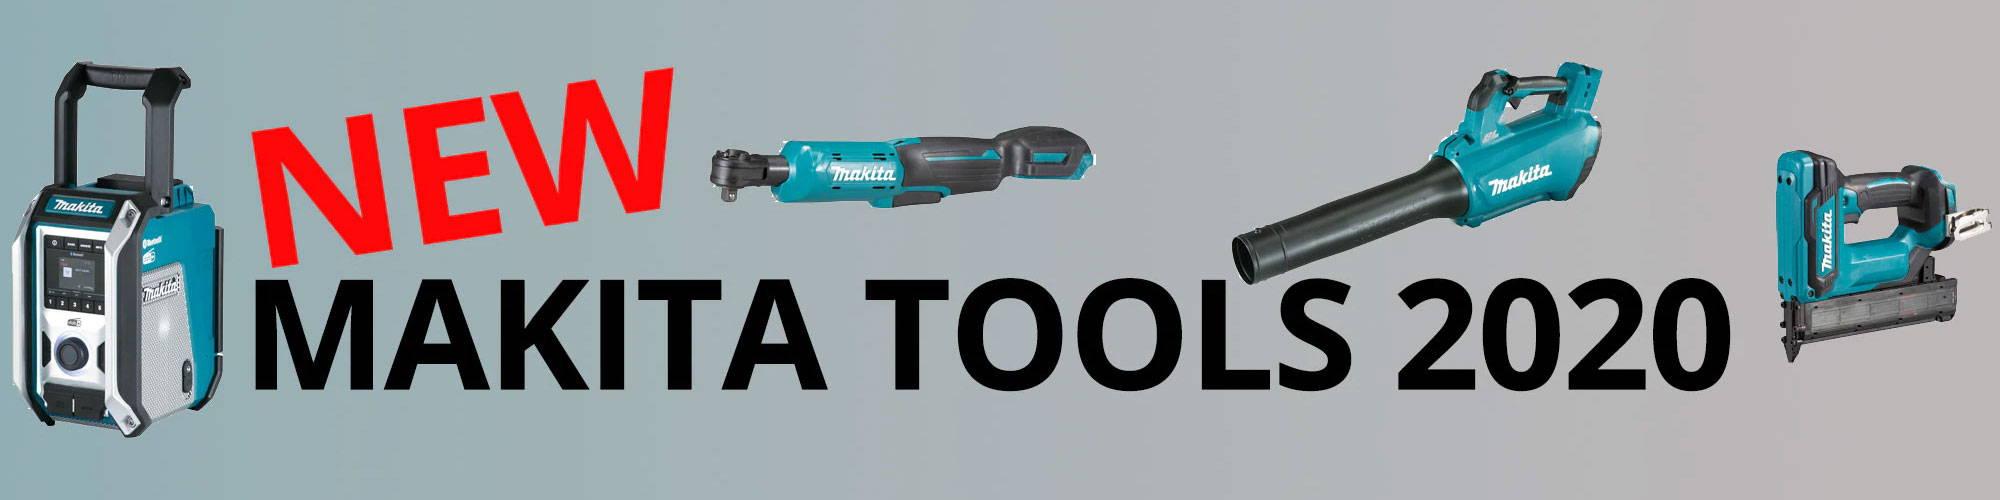 New Makita Tools January 2020